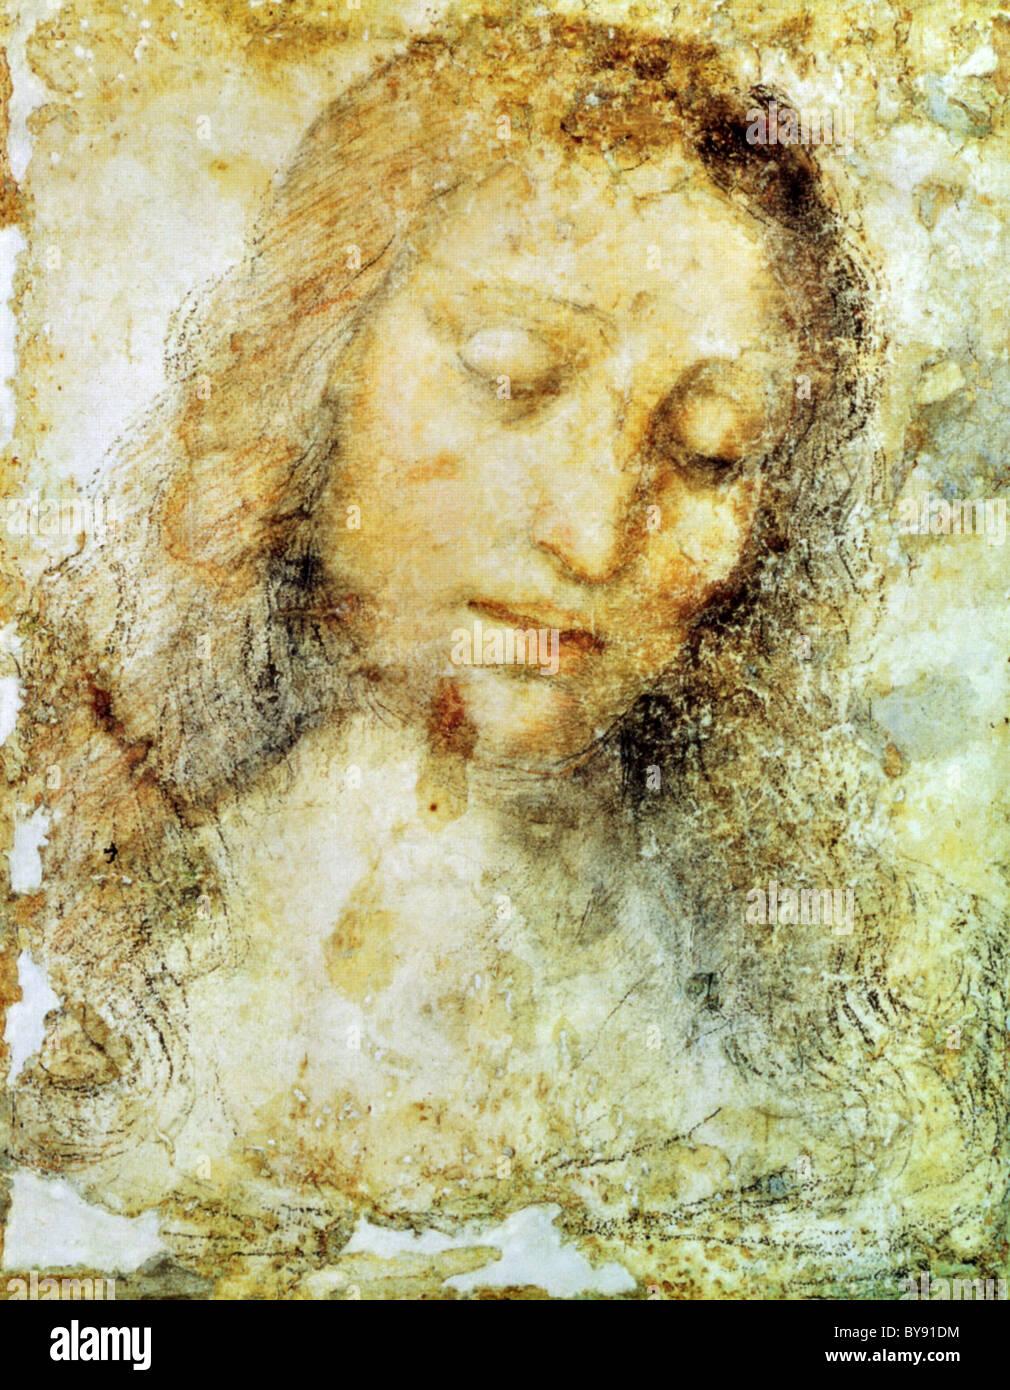 Kopf des Christus von Leonardo da Vinci. Stockbild